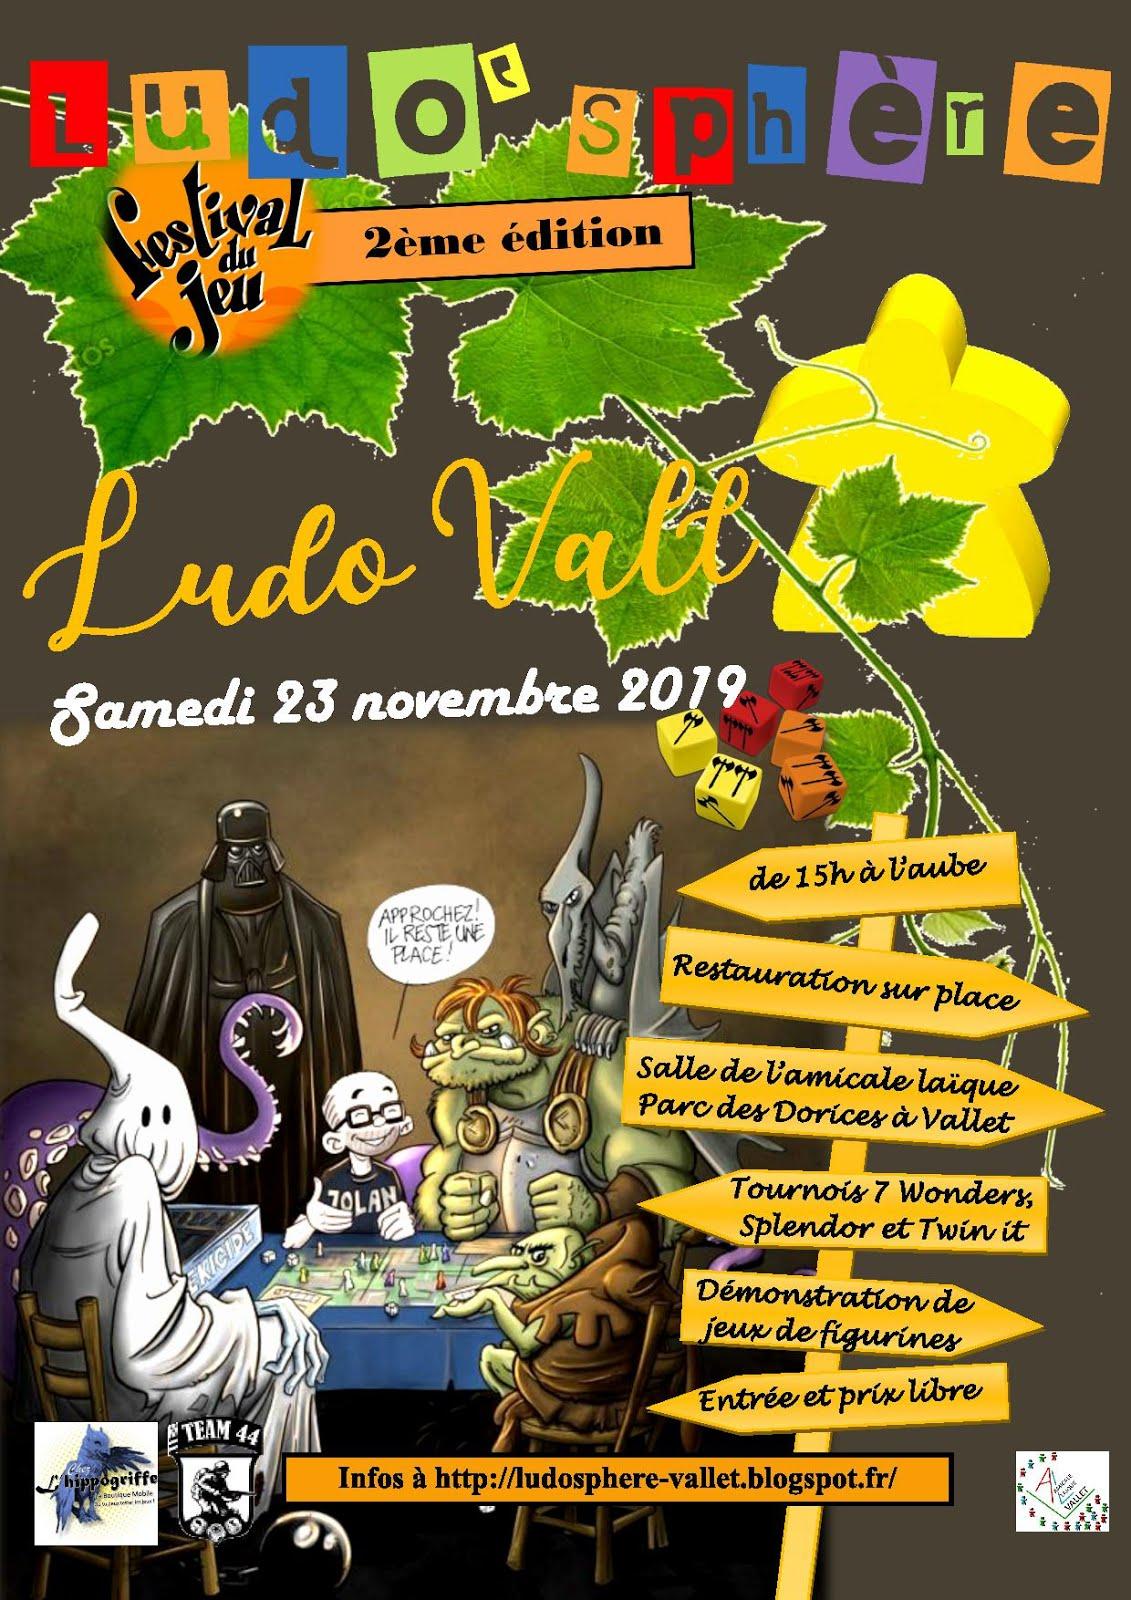 FESTIVAL LUDO'VALL